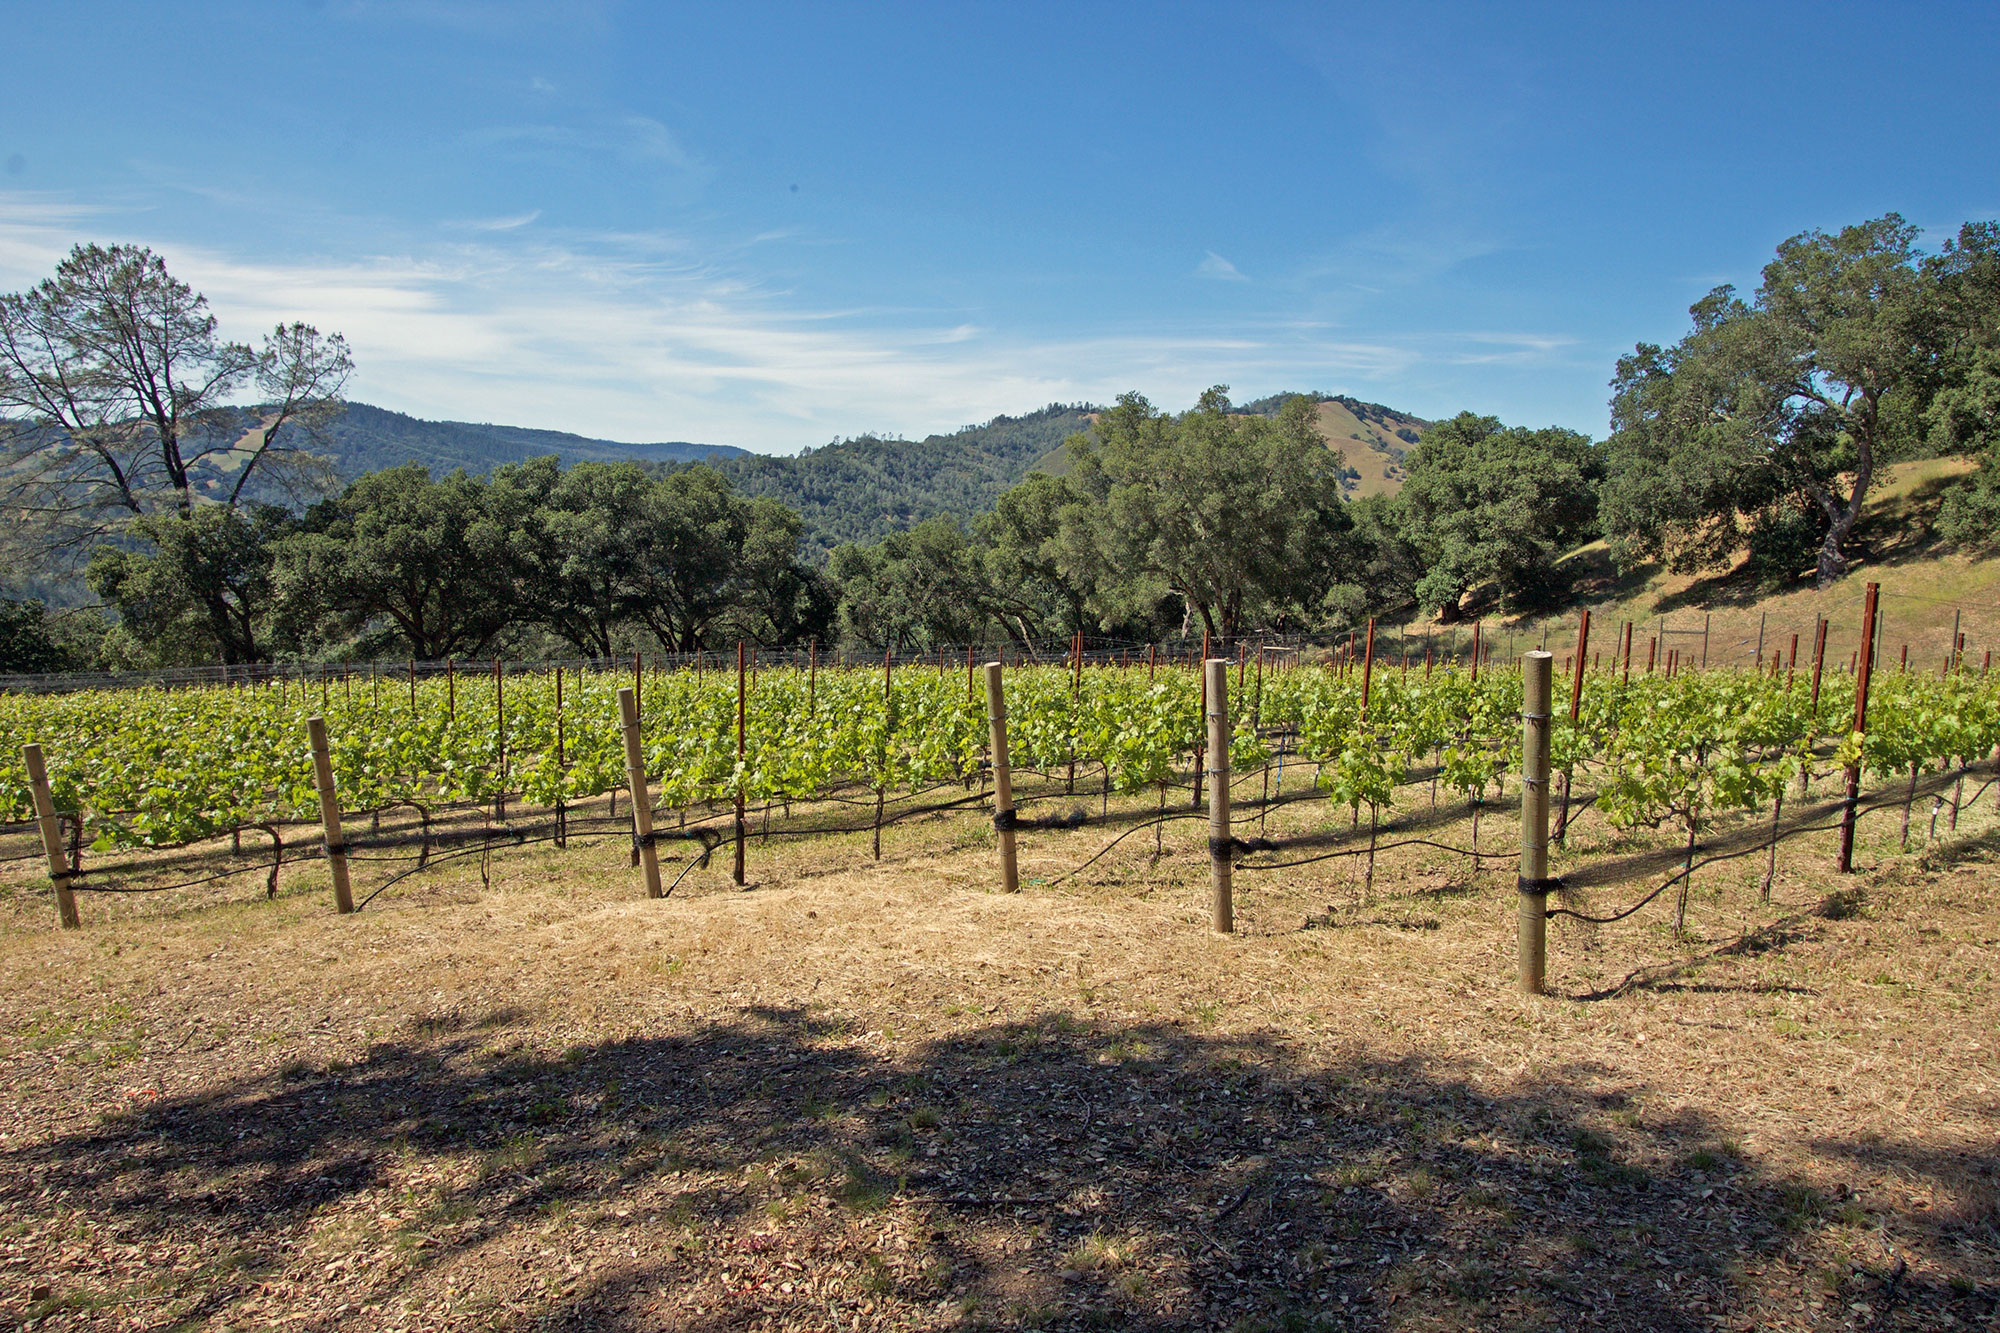 Vineyard View across premium Napa Valley vineyard